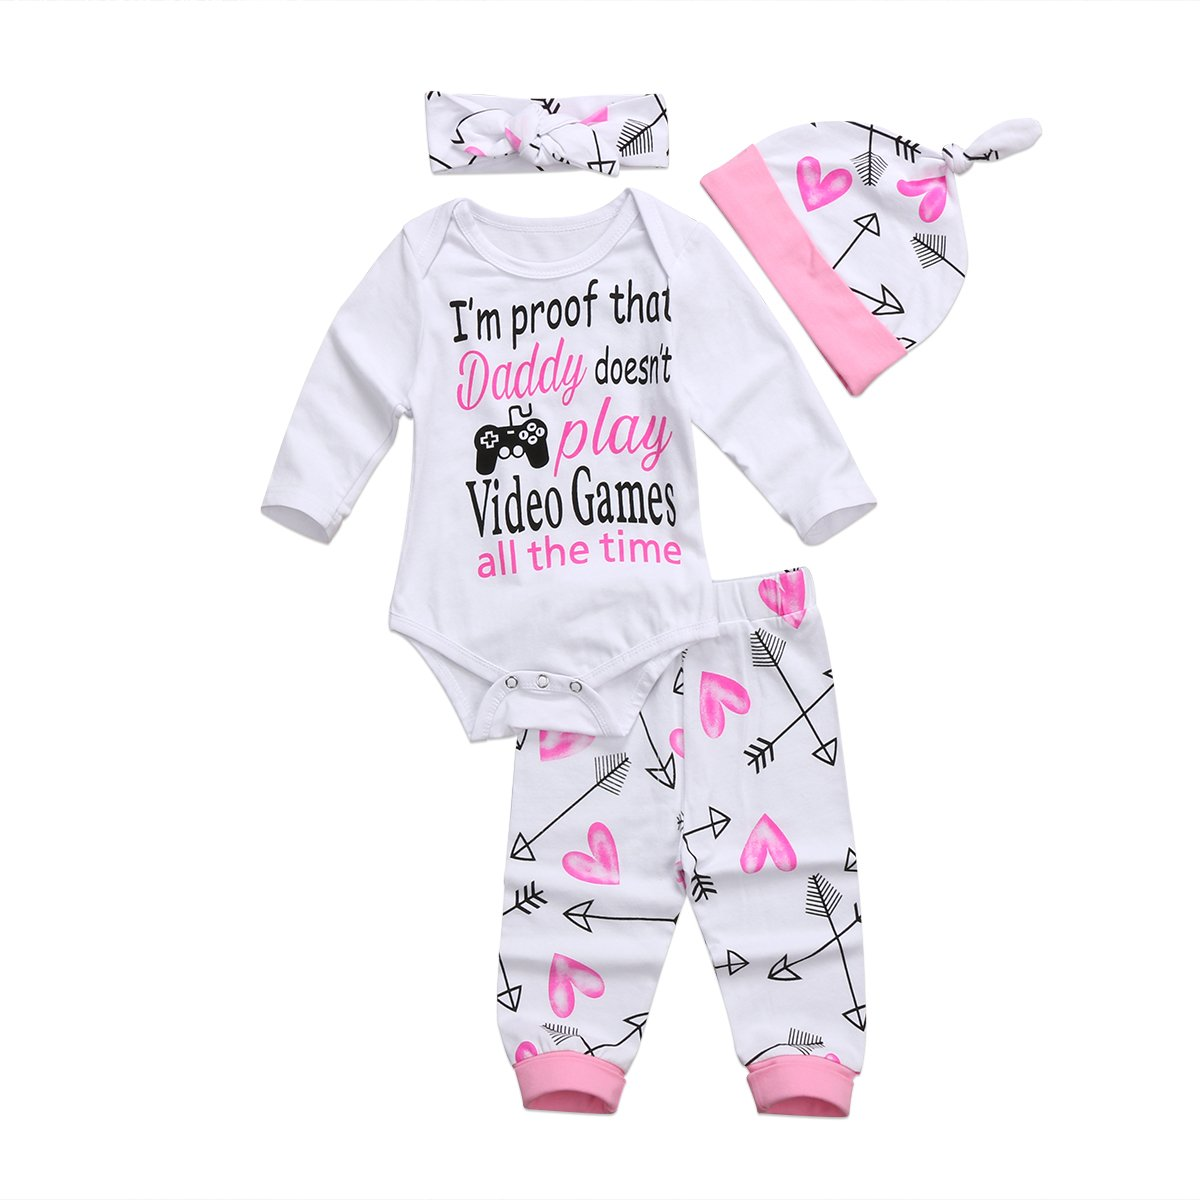 Mialoley Newborn Baby Thanksgiving Outfit White Romper Arrow Print Pants Hat Headband Set 4PCS Winter Xmas Clothing